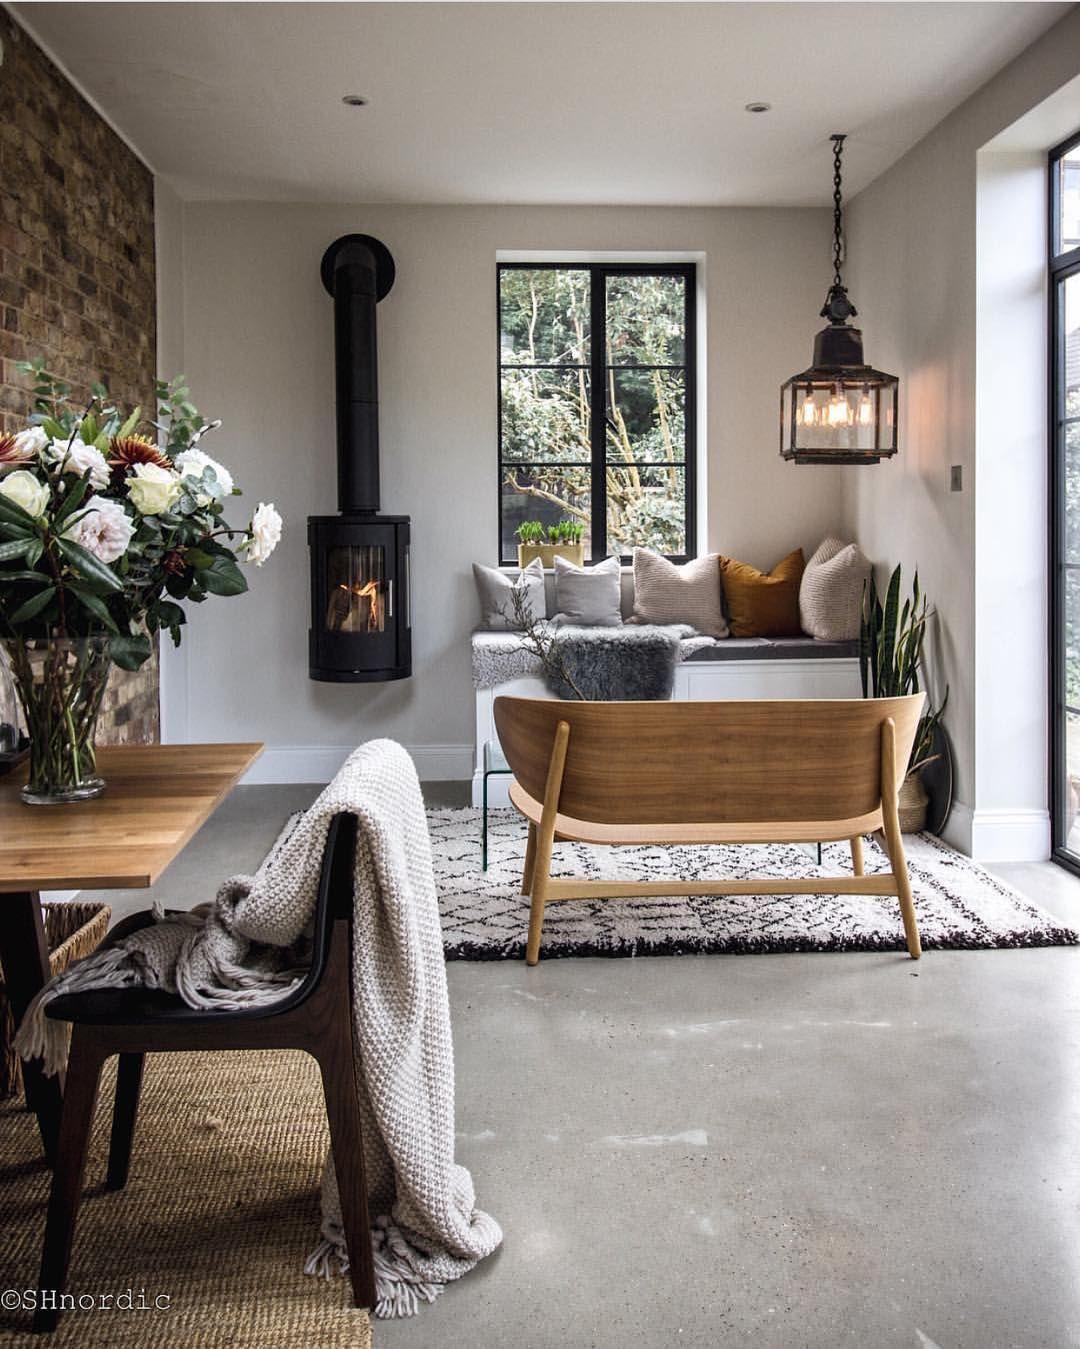 Beautiful home interiors pin by hale on b e a u t i f u l  h o m e s   pinterest